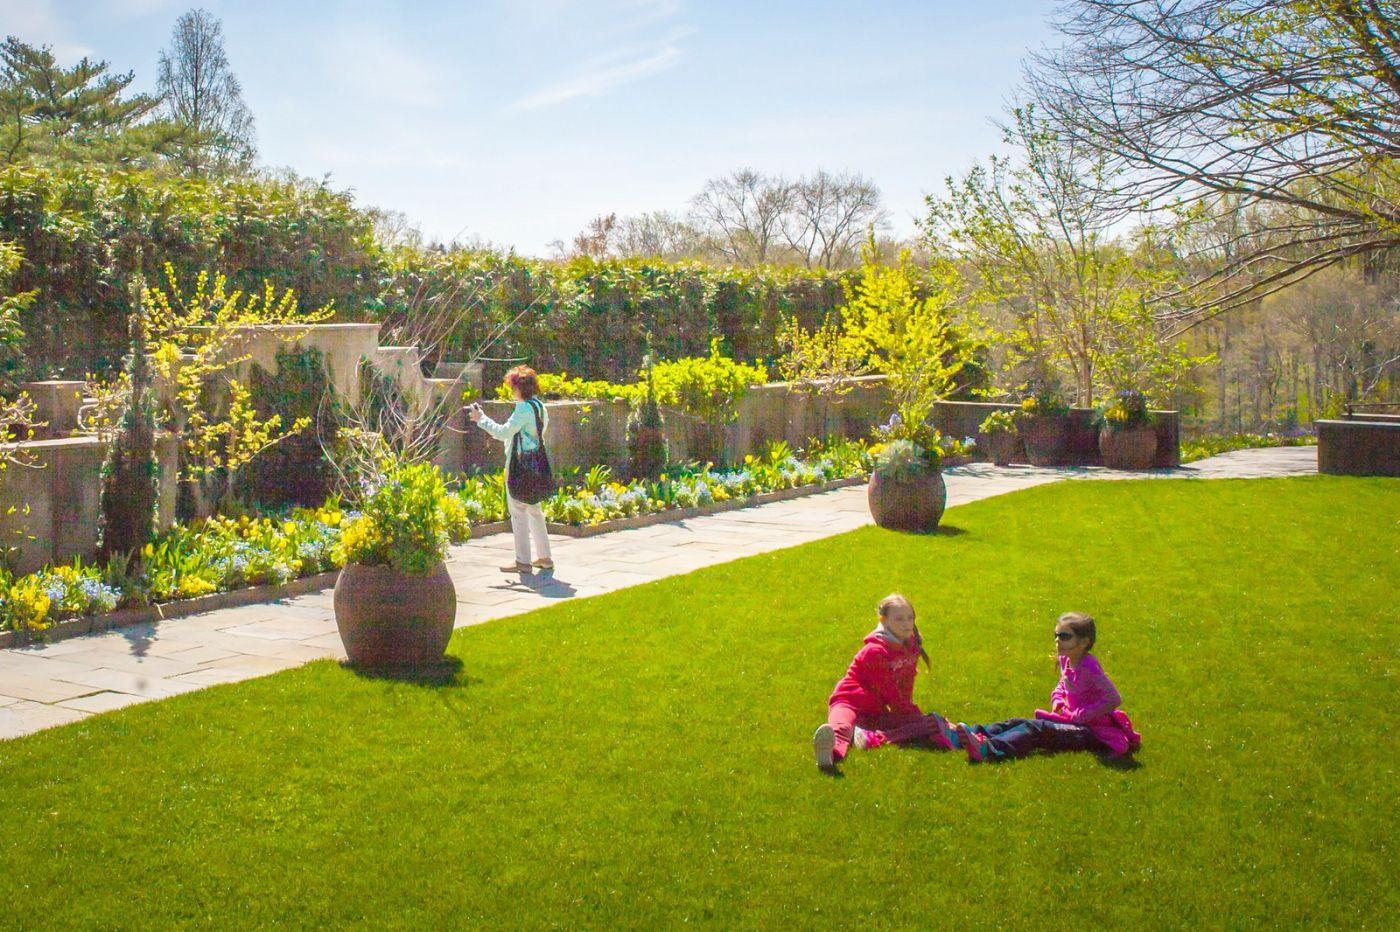 Chanticleer花园,享受大自然_图1-9